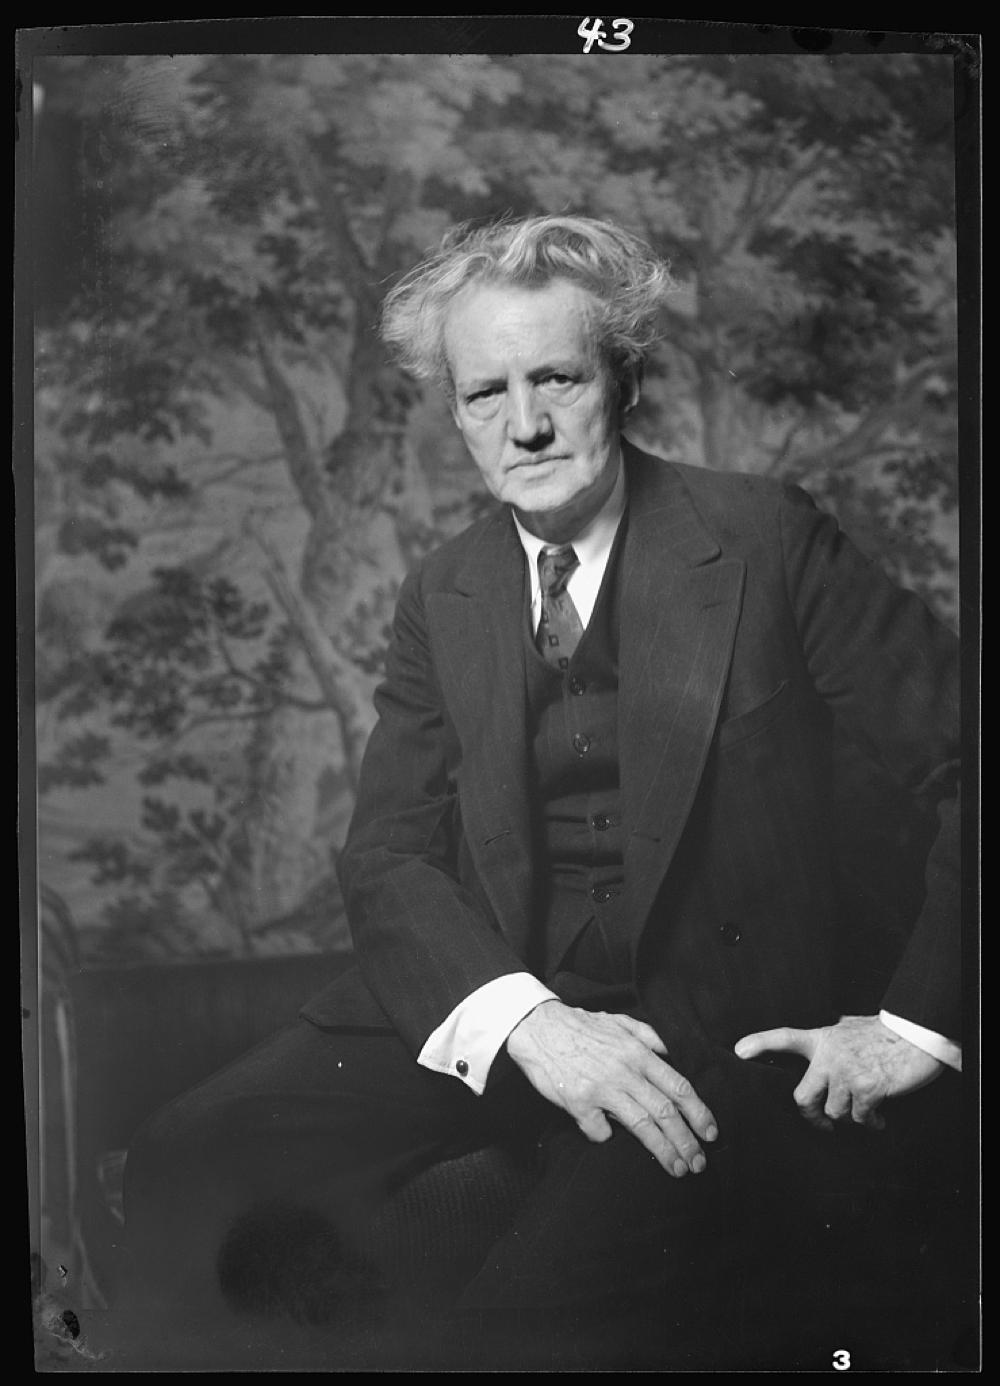 Portrait photograph of Arnold Genthe